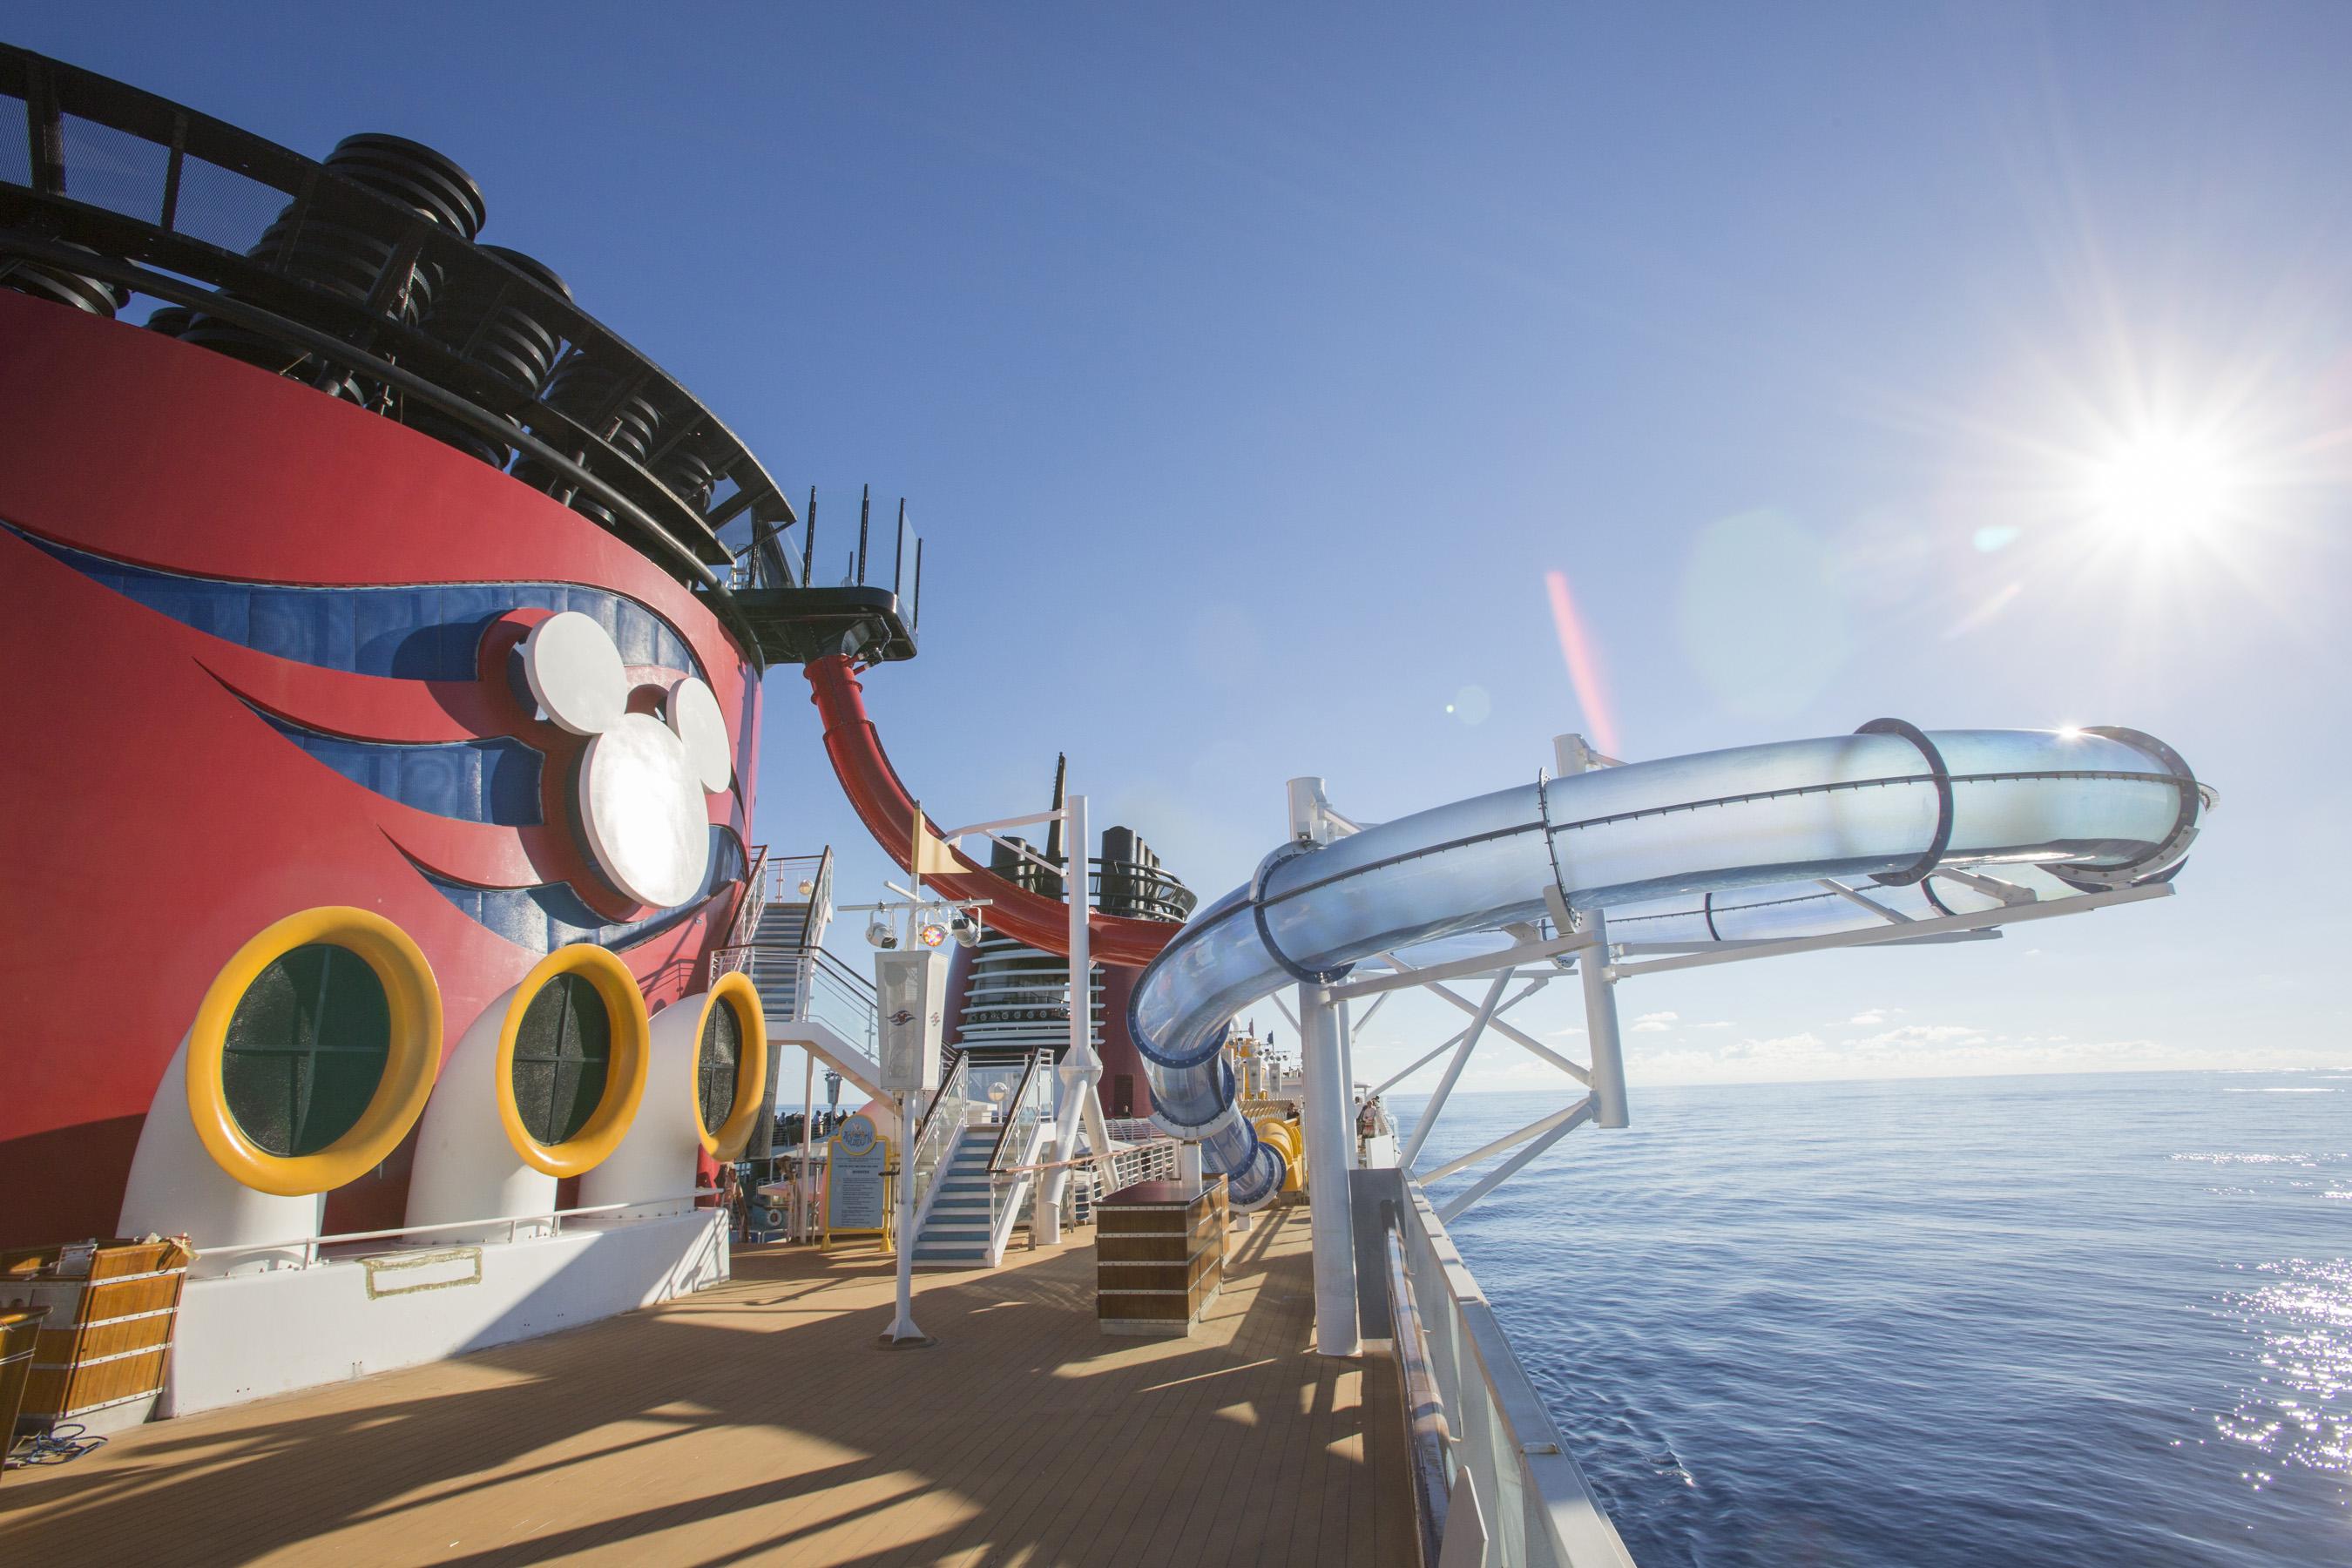 AquaDunk Water Slide on the Re-Imagined Disney Magic